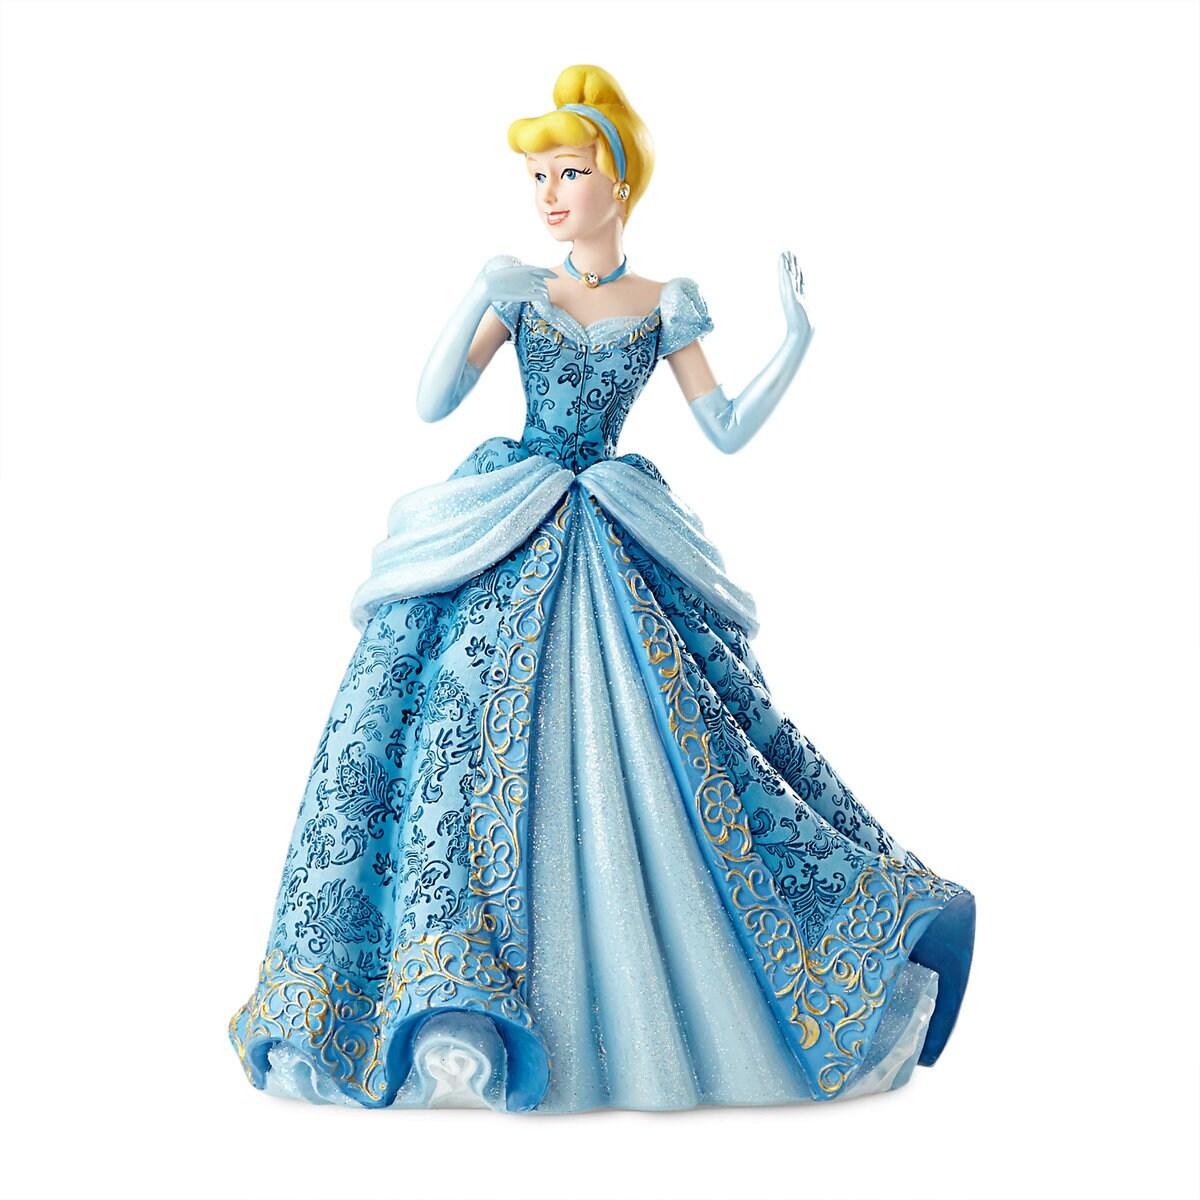 Product Image of Cinderella Couture de Force Figurine by Enesco - Cinderella # 1